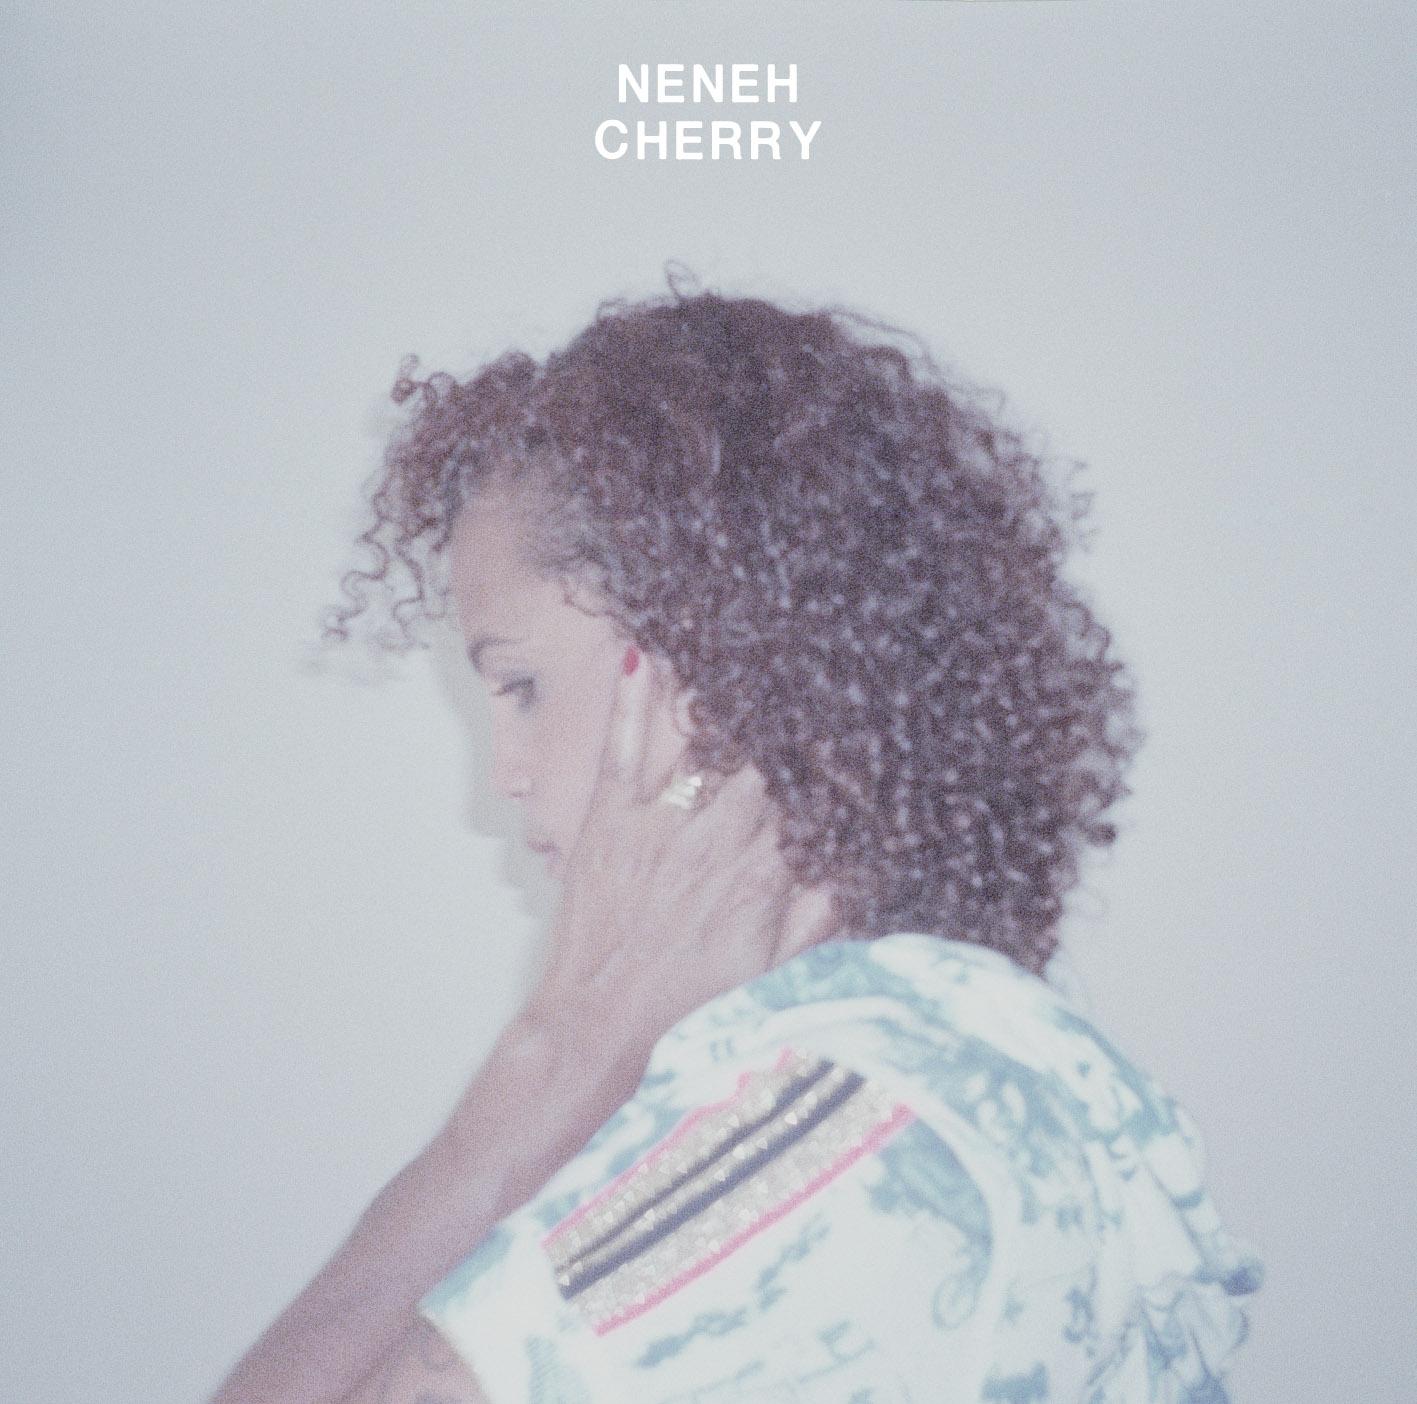 NenehCherry